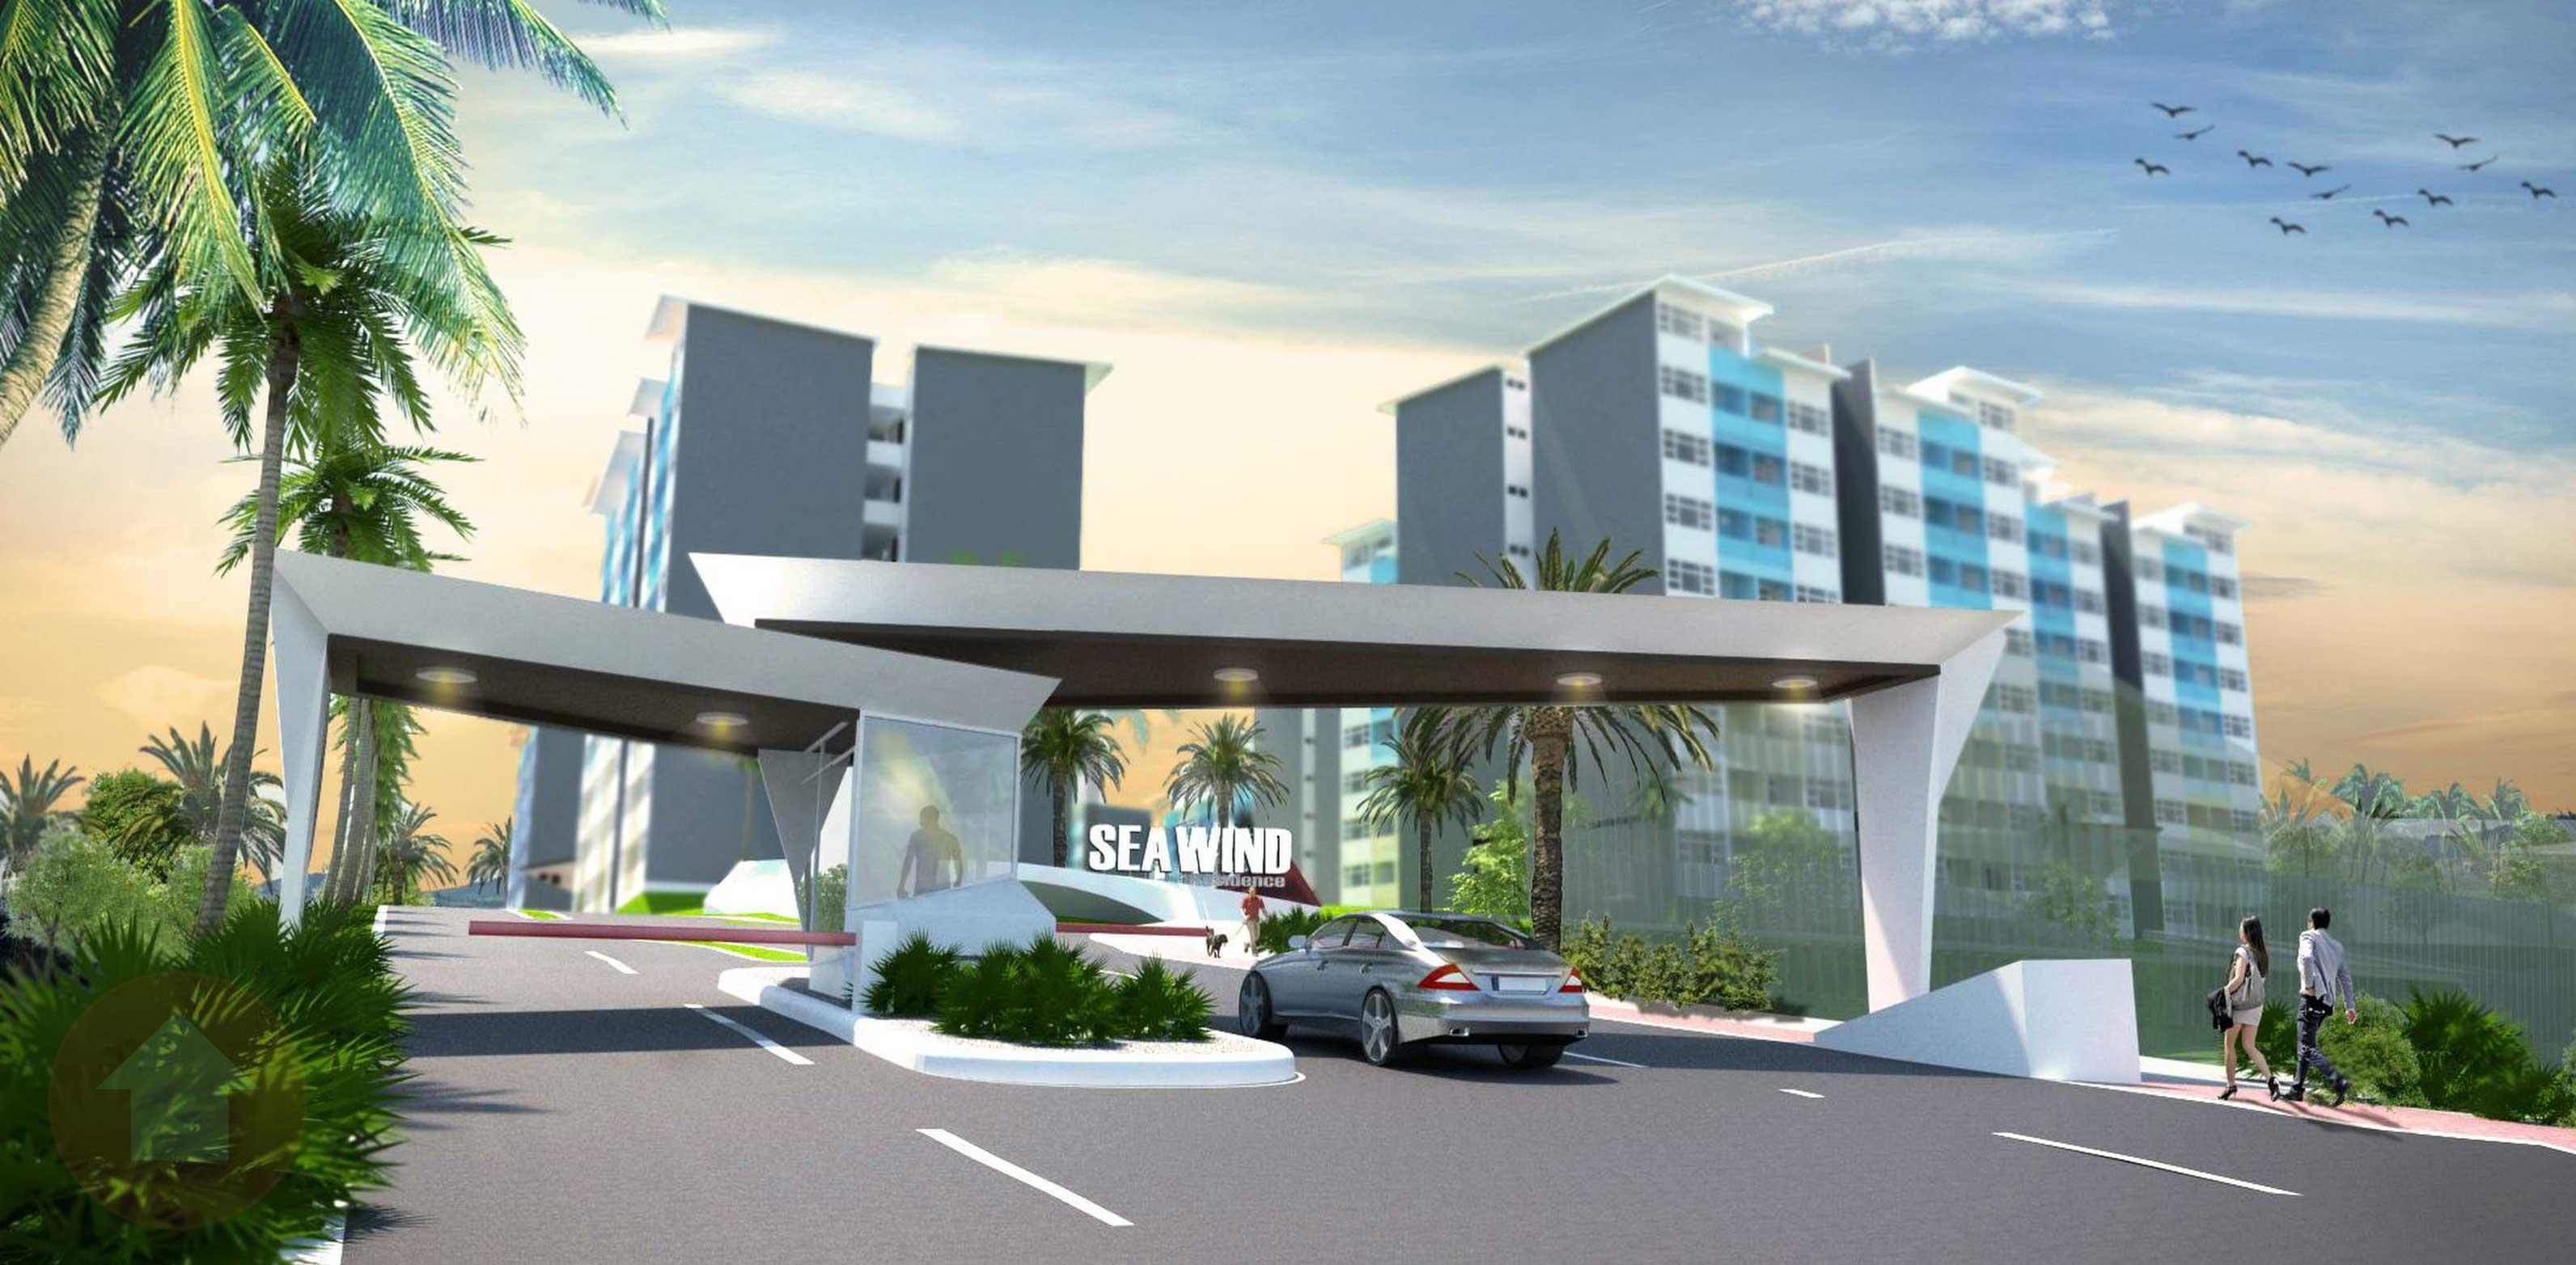 Seawind: mixed use condo development in Davao by Damosa Land